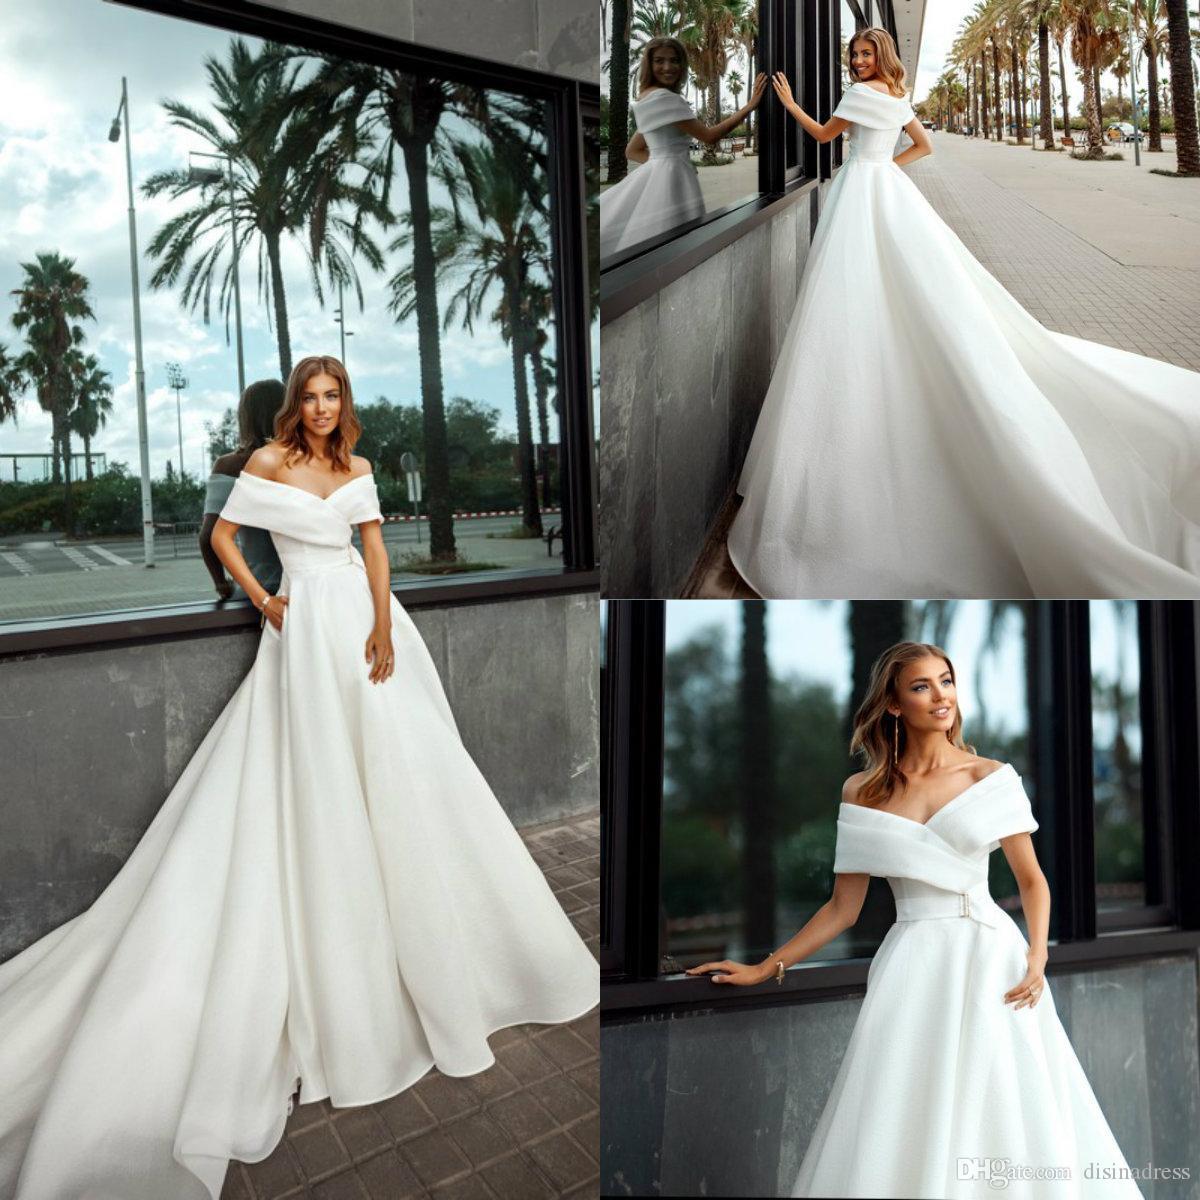 2020 Garden Beach Wedding Dresses Simple A Line Satin Sweep Train Boho Wedding Dress Off The Shoulder Bridal Gowns Abiti da sposa